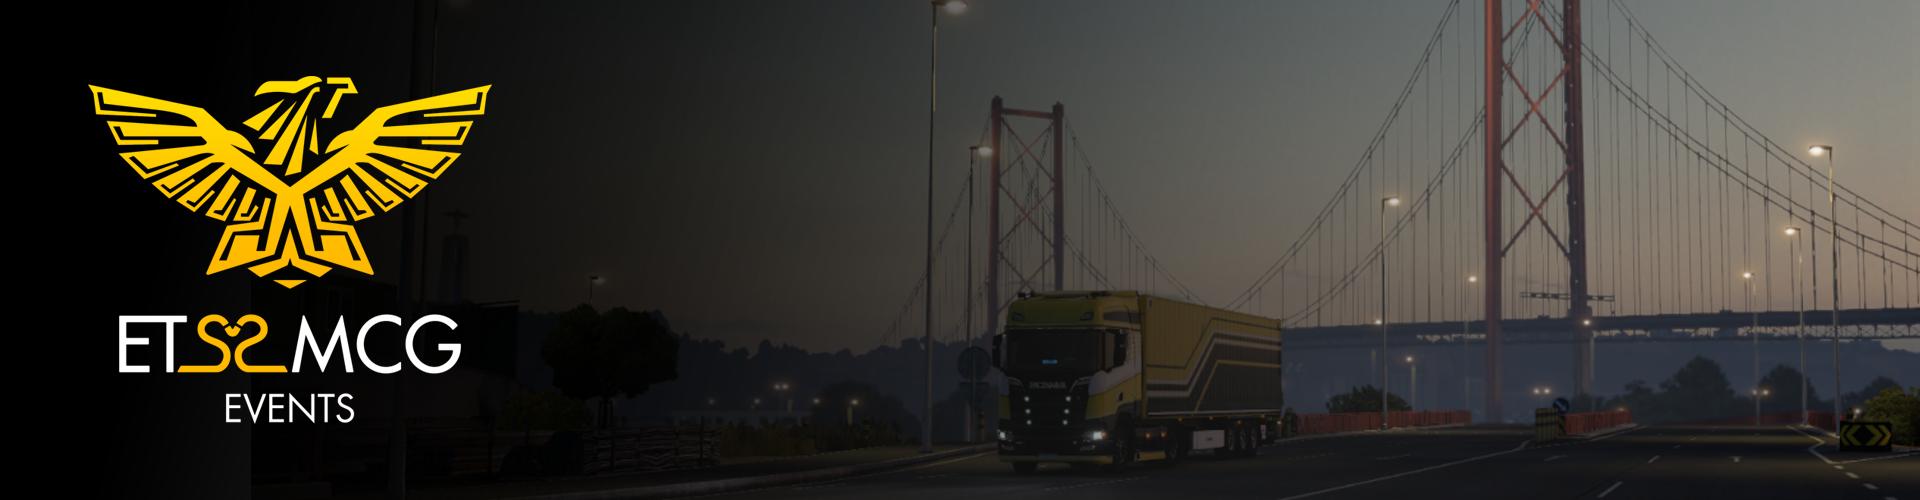 ETS2MCG 5th Anniversary Convoy